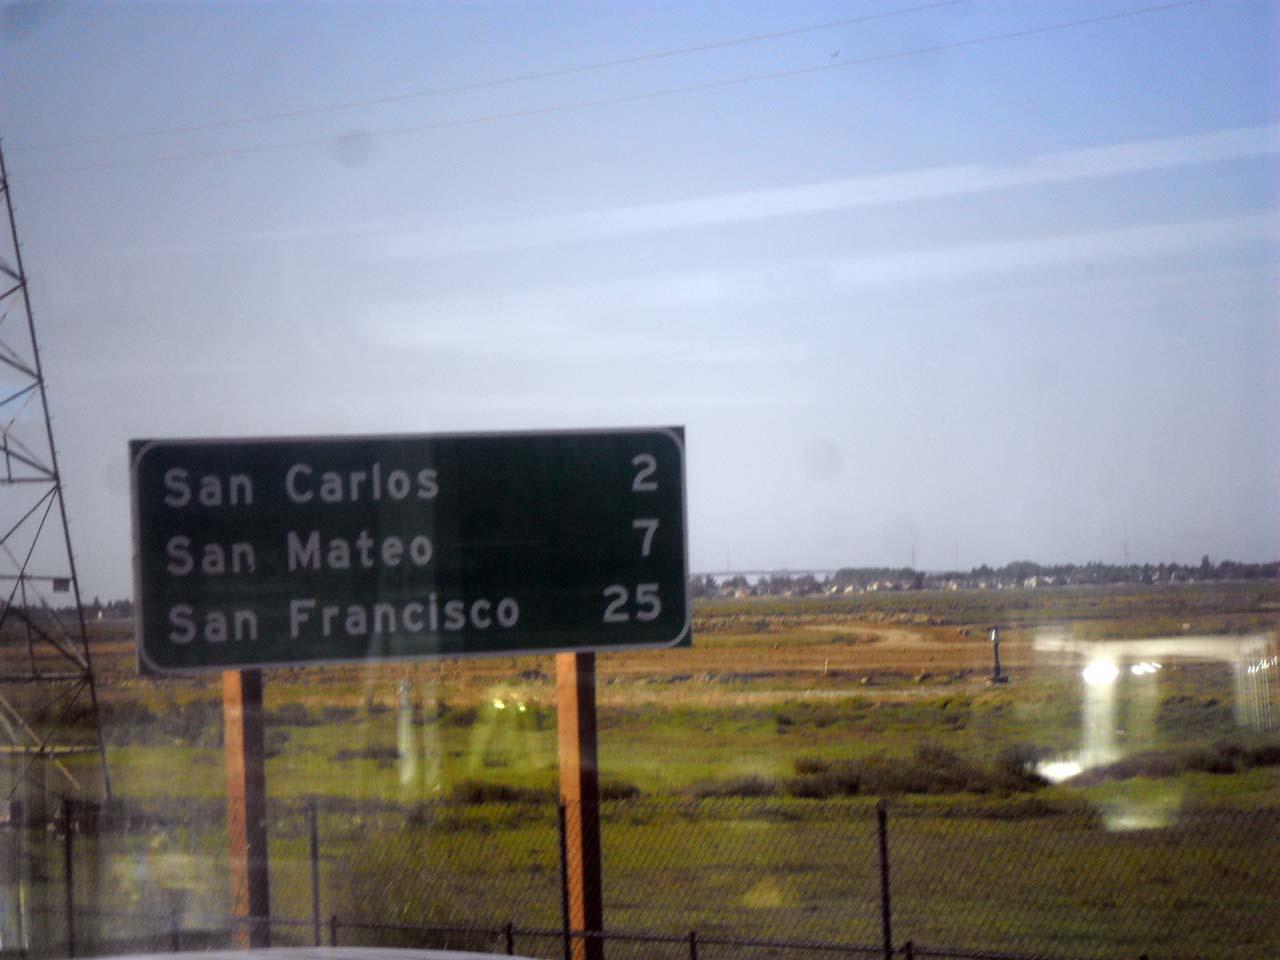 San Francisco'ya 25 mil..